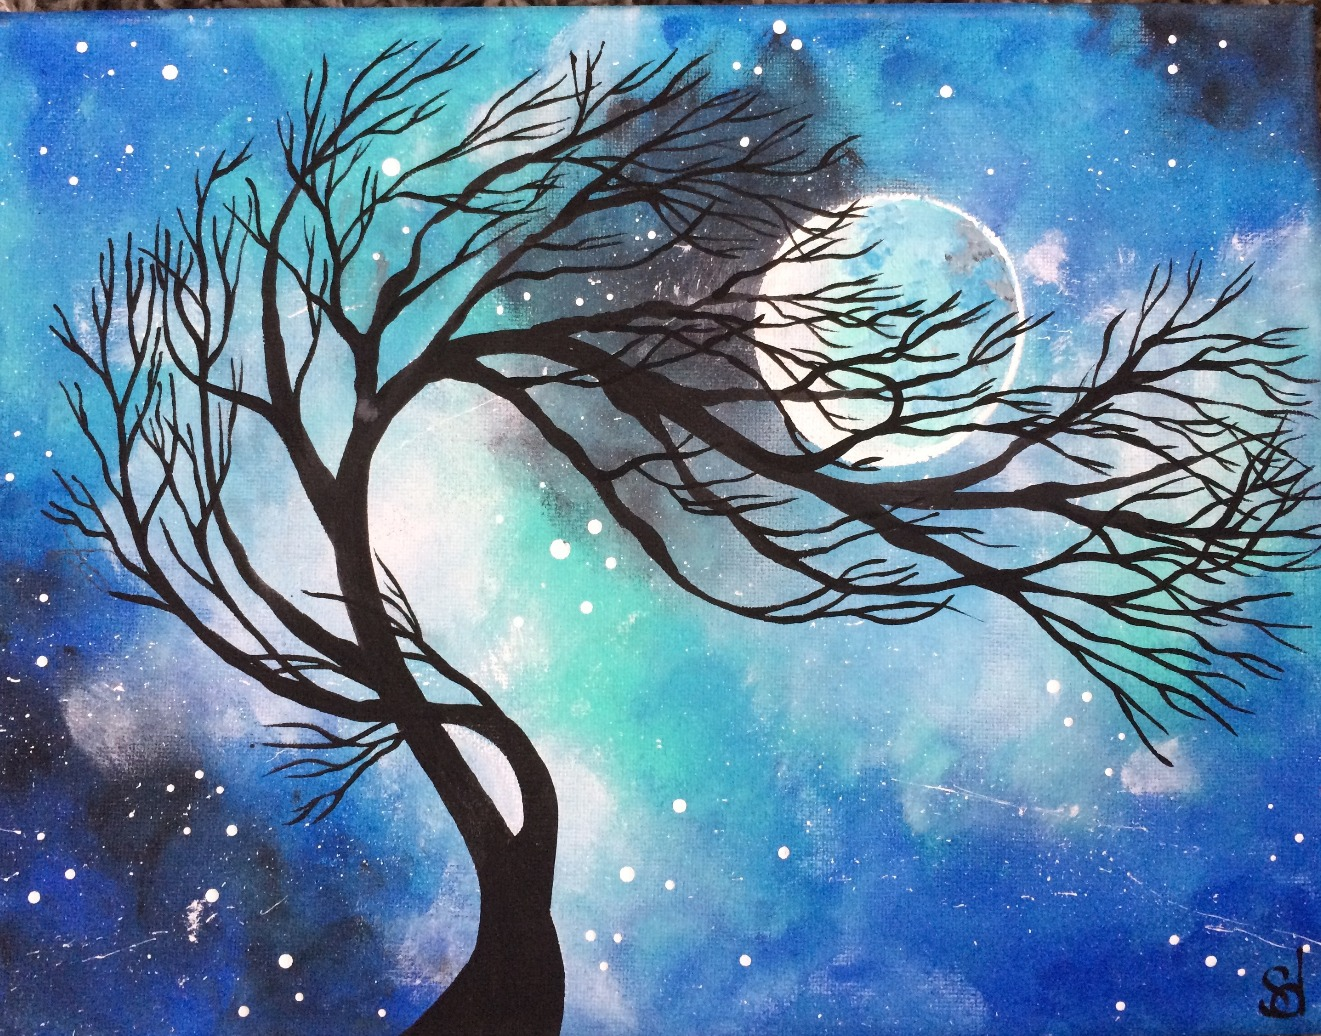 Moonlit Sway